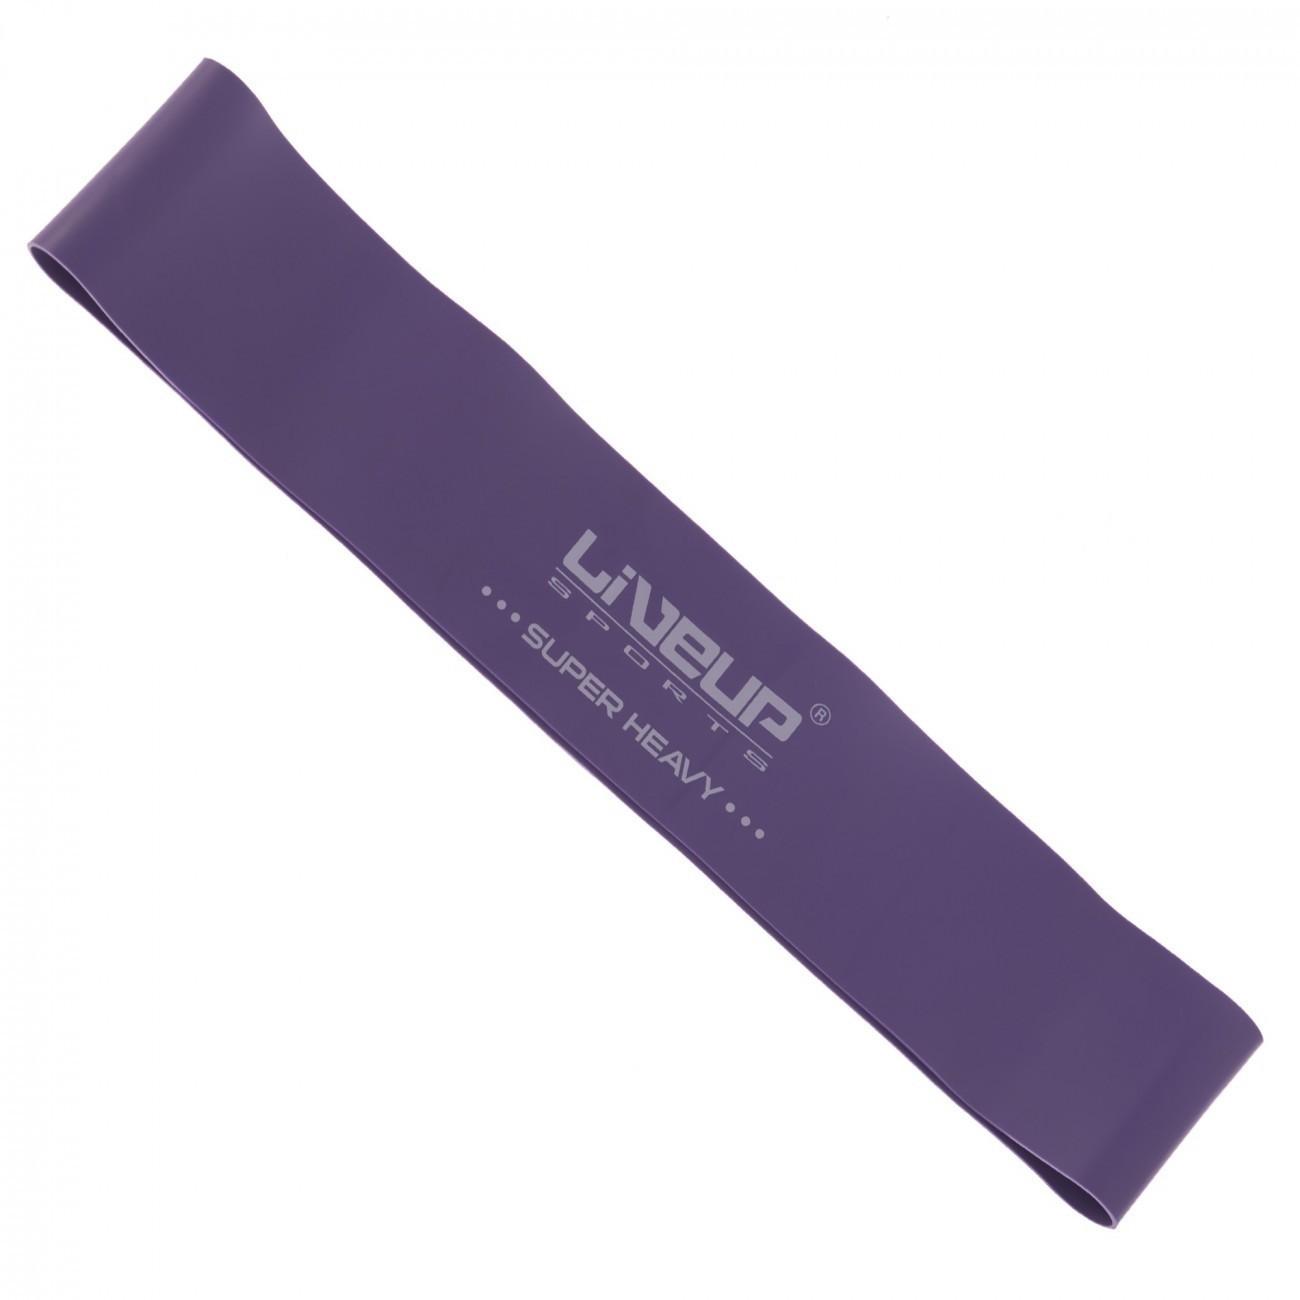 Mini Bands - Intensidade Super Forte - 25x5x0,10cm - Liveup